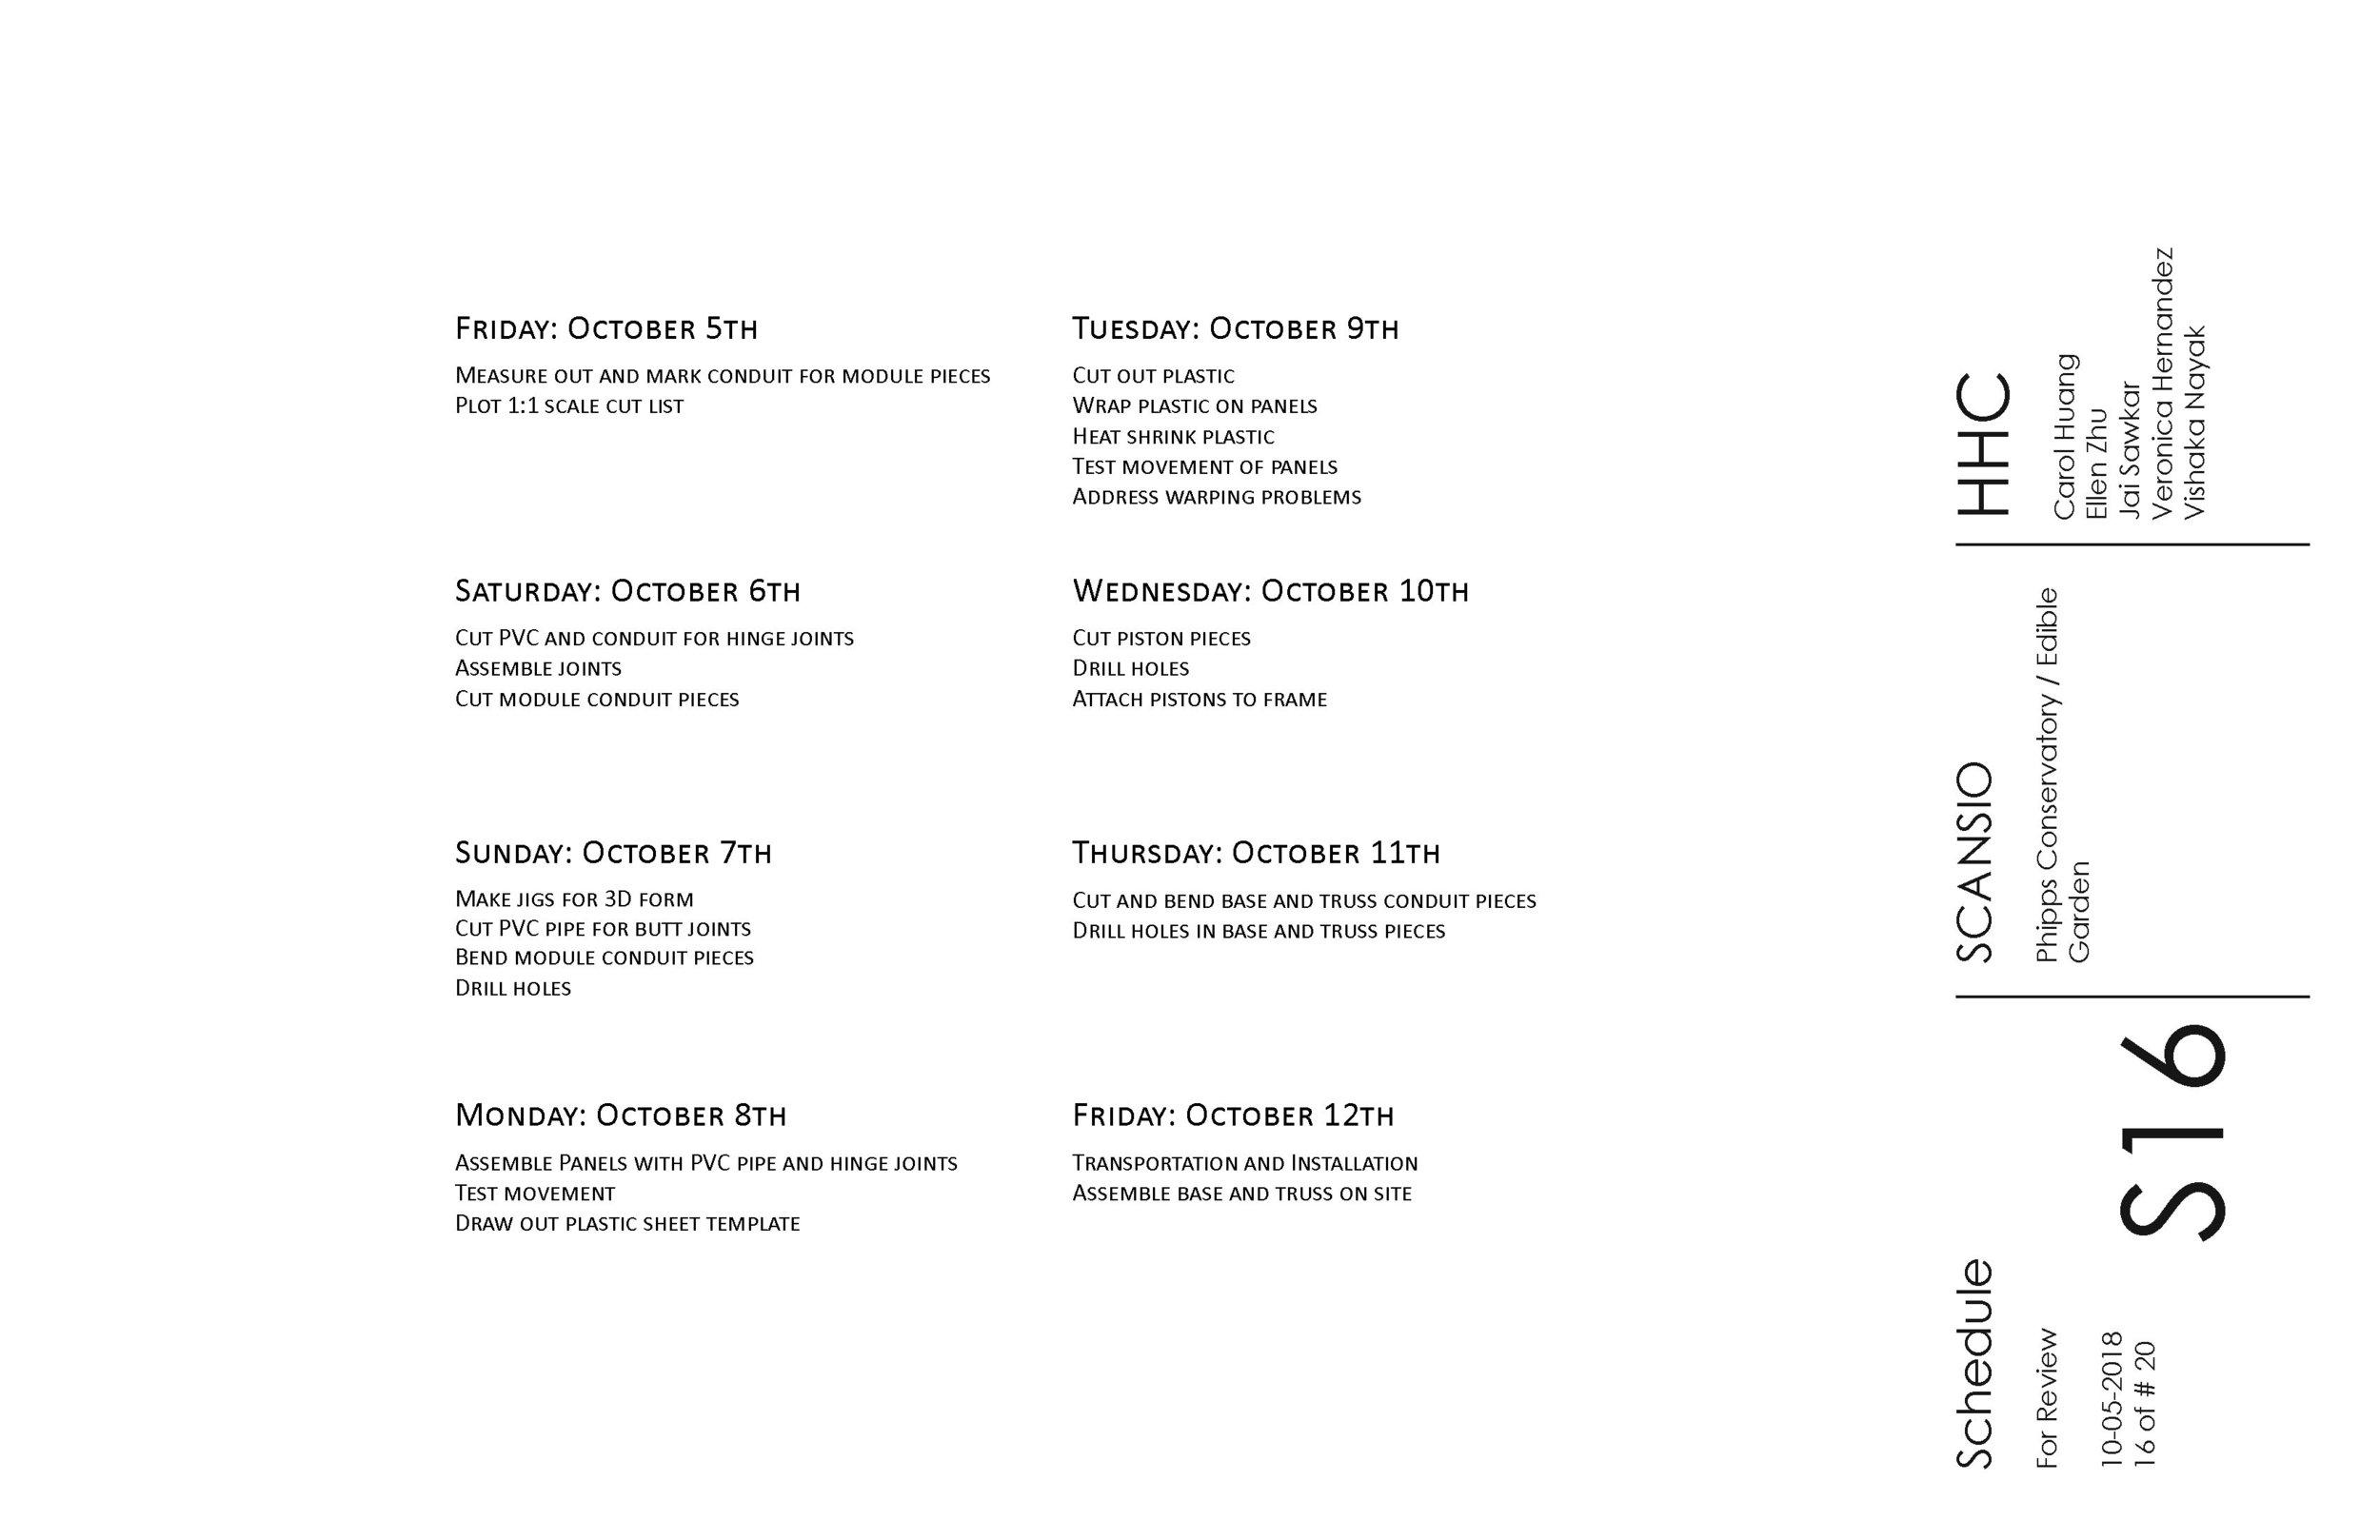 SCANSIO by HHC (1)_Page_18.jpg